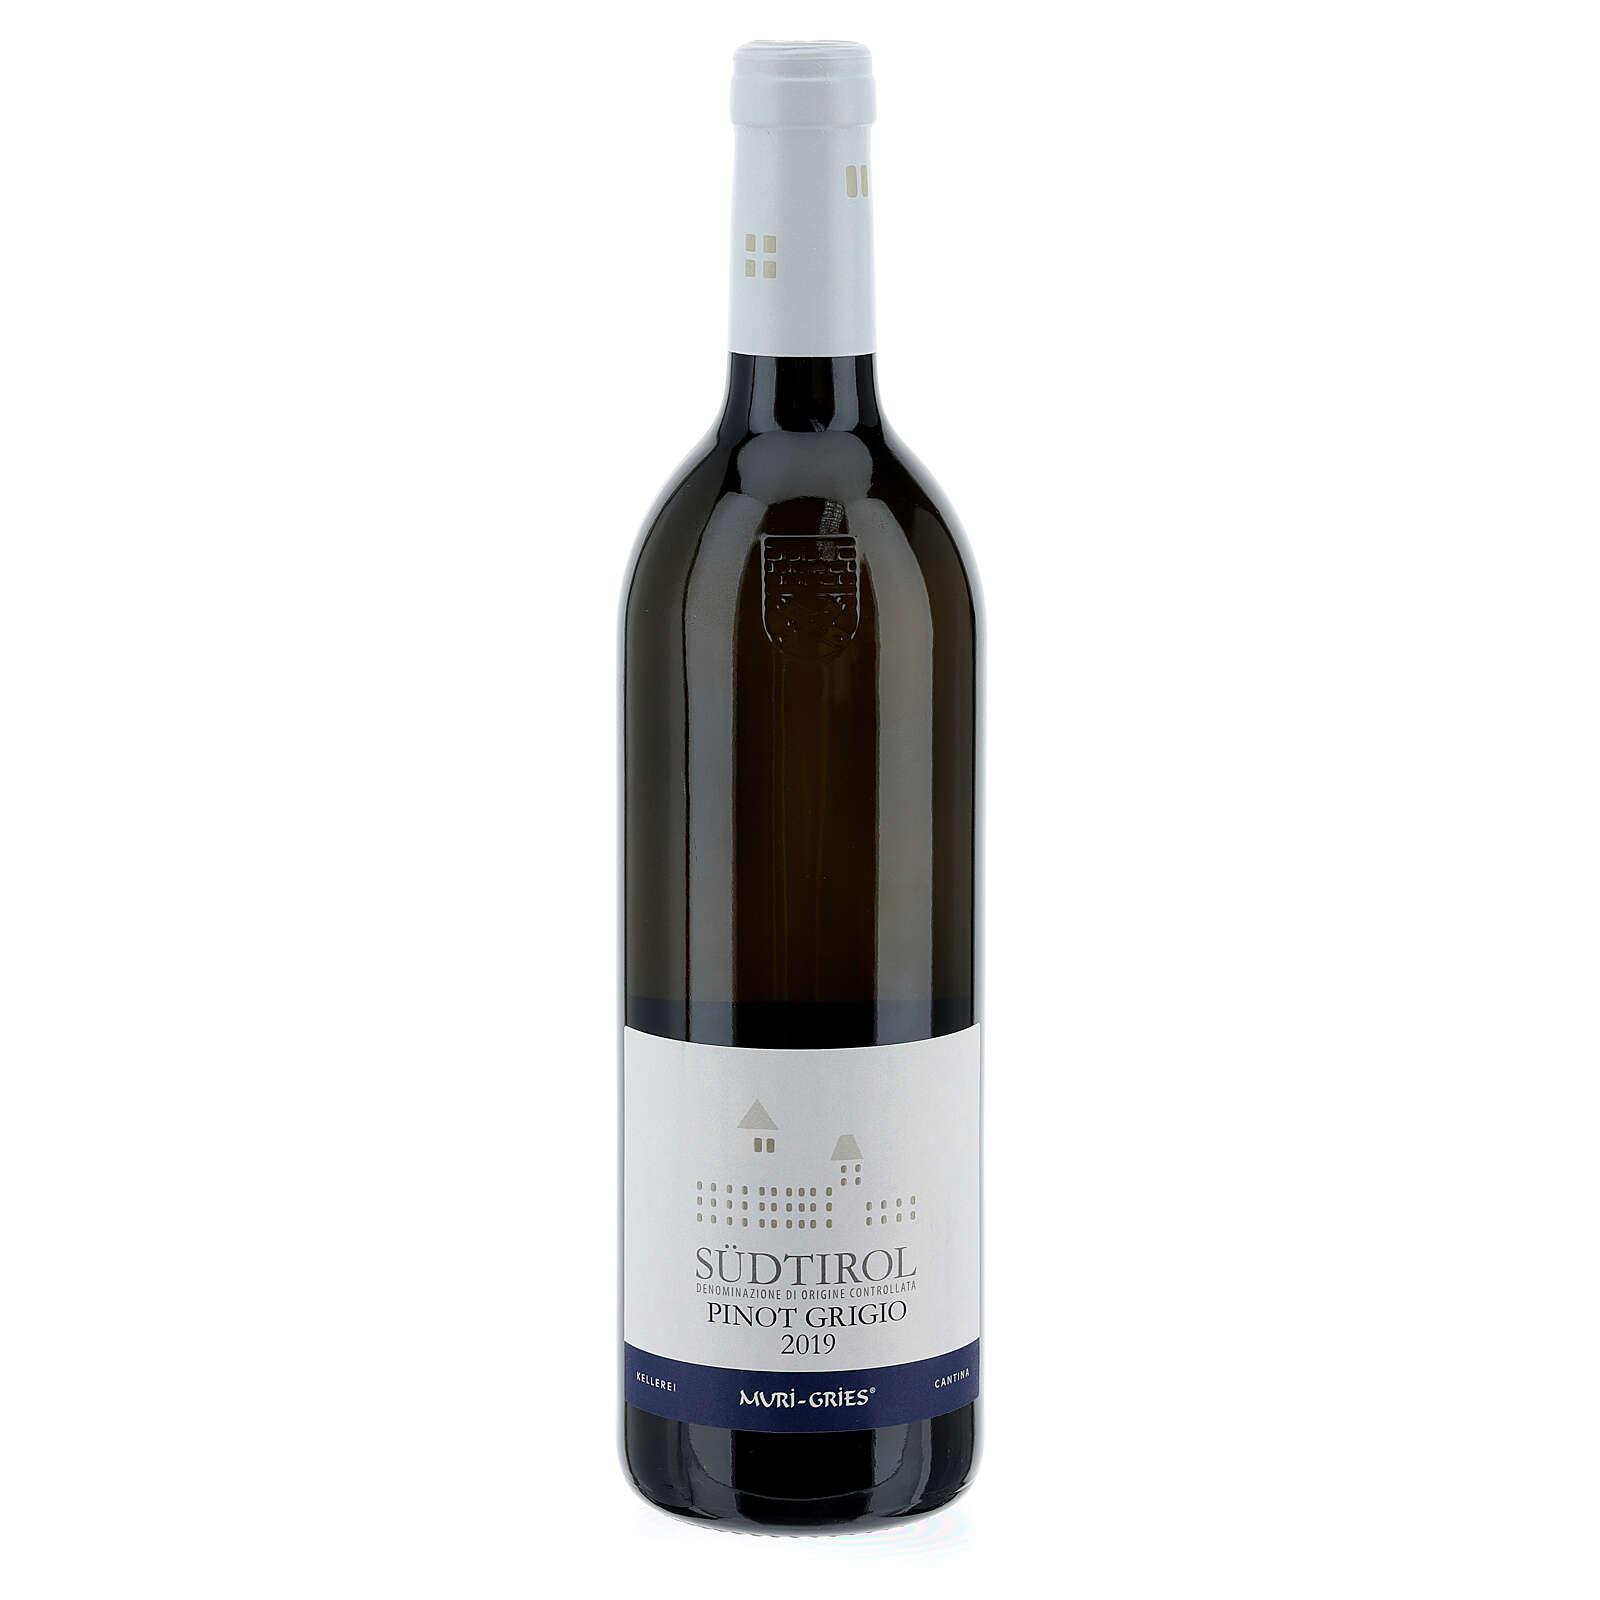 Vin Pinot Gris DOC 2019 Abbaye Muri Gries 3